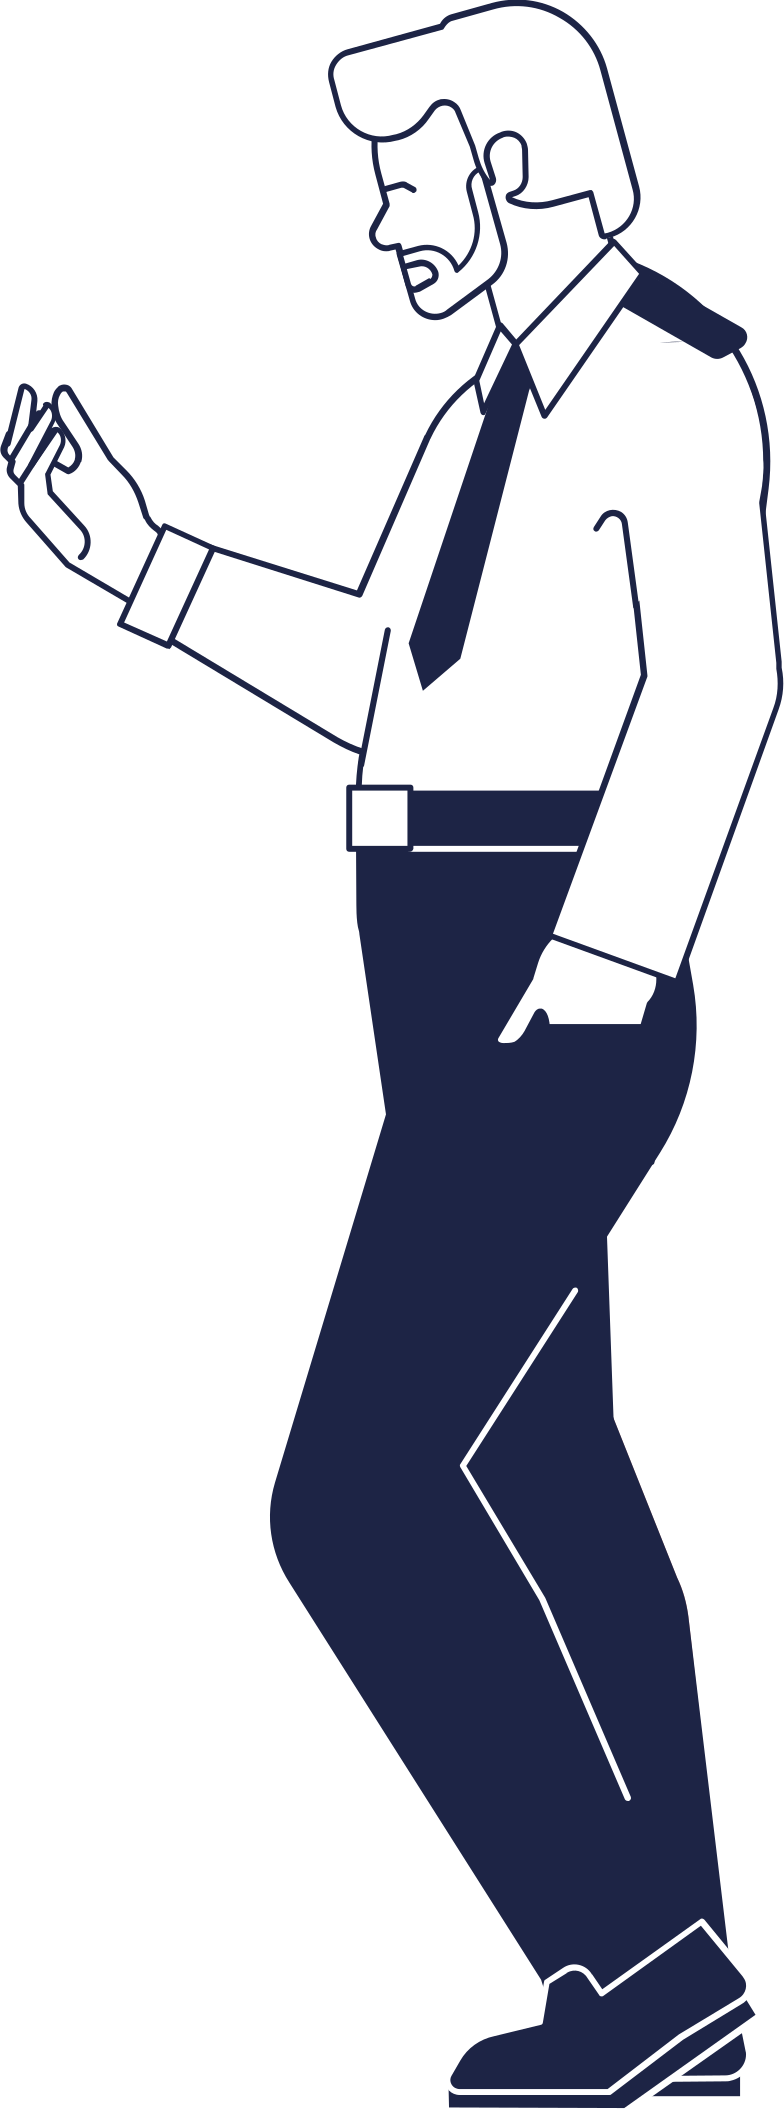 police man Clipart illustration in PNG, SVG